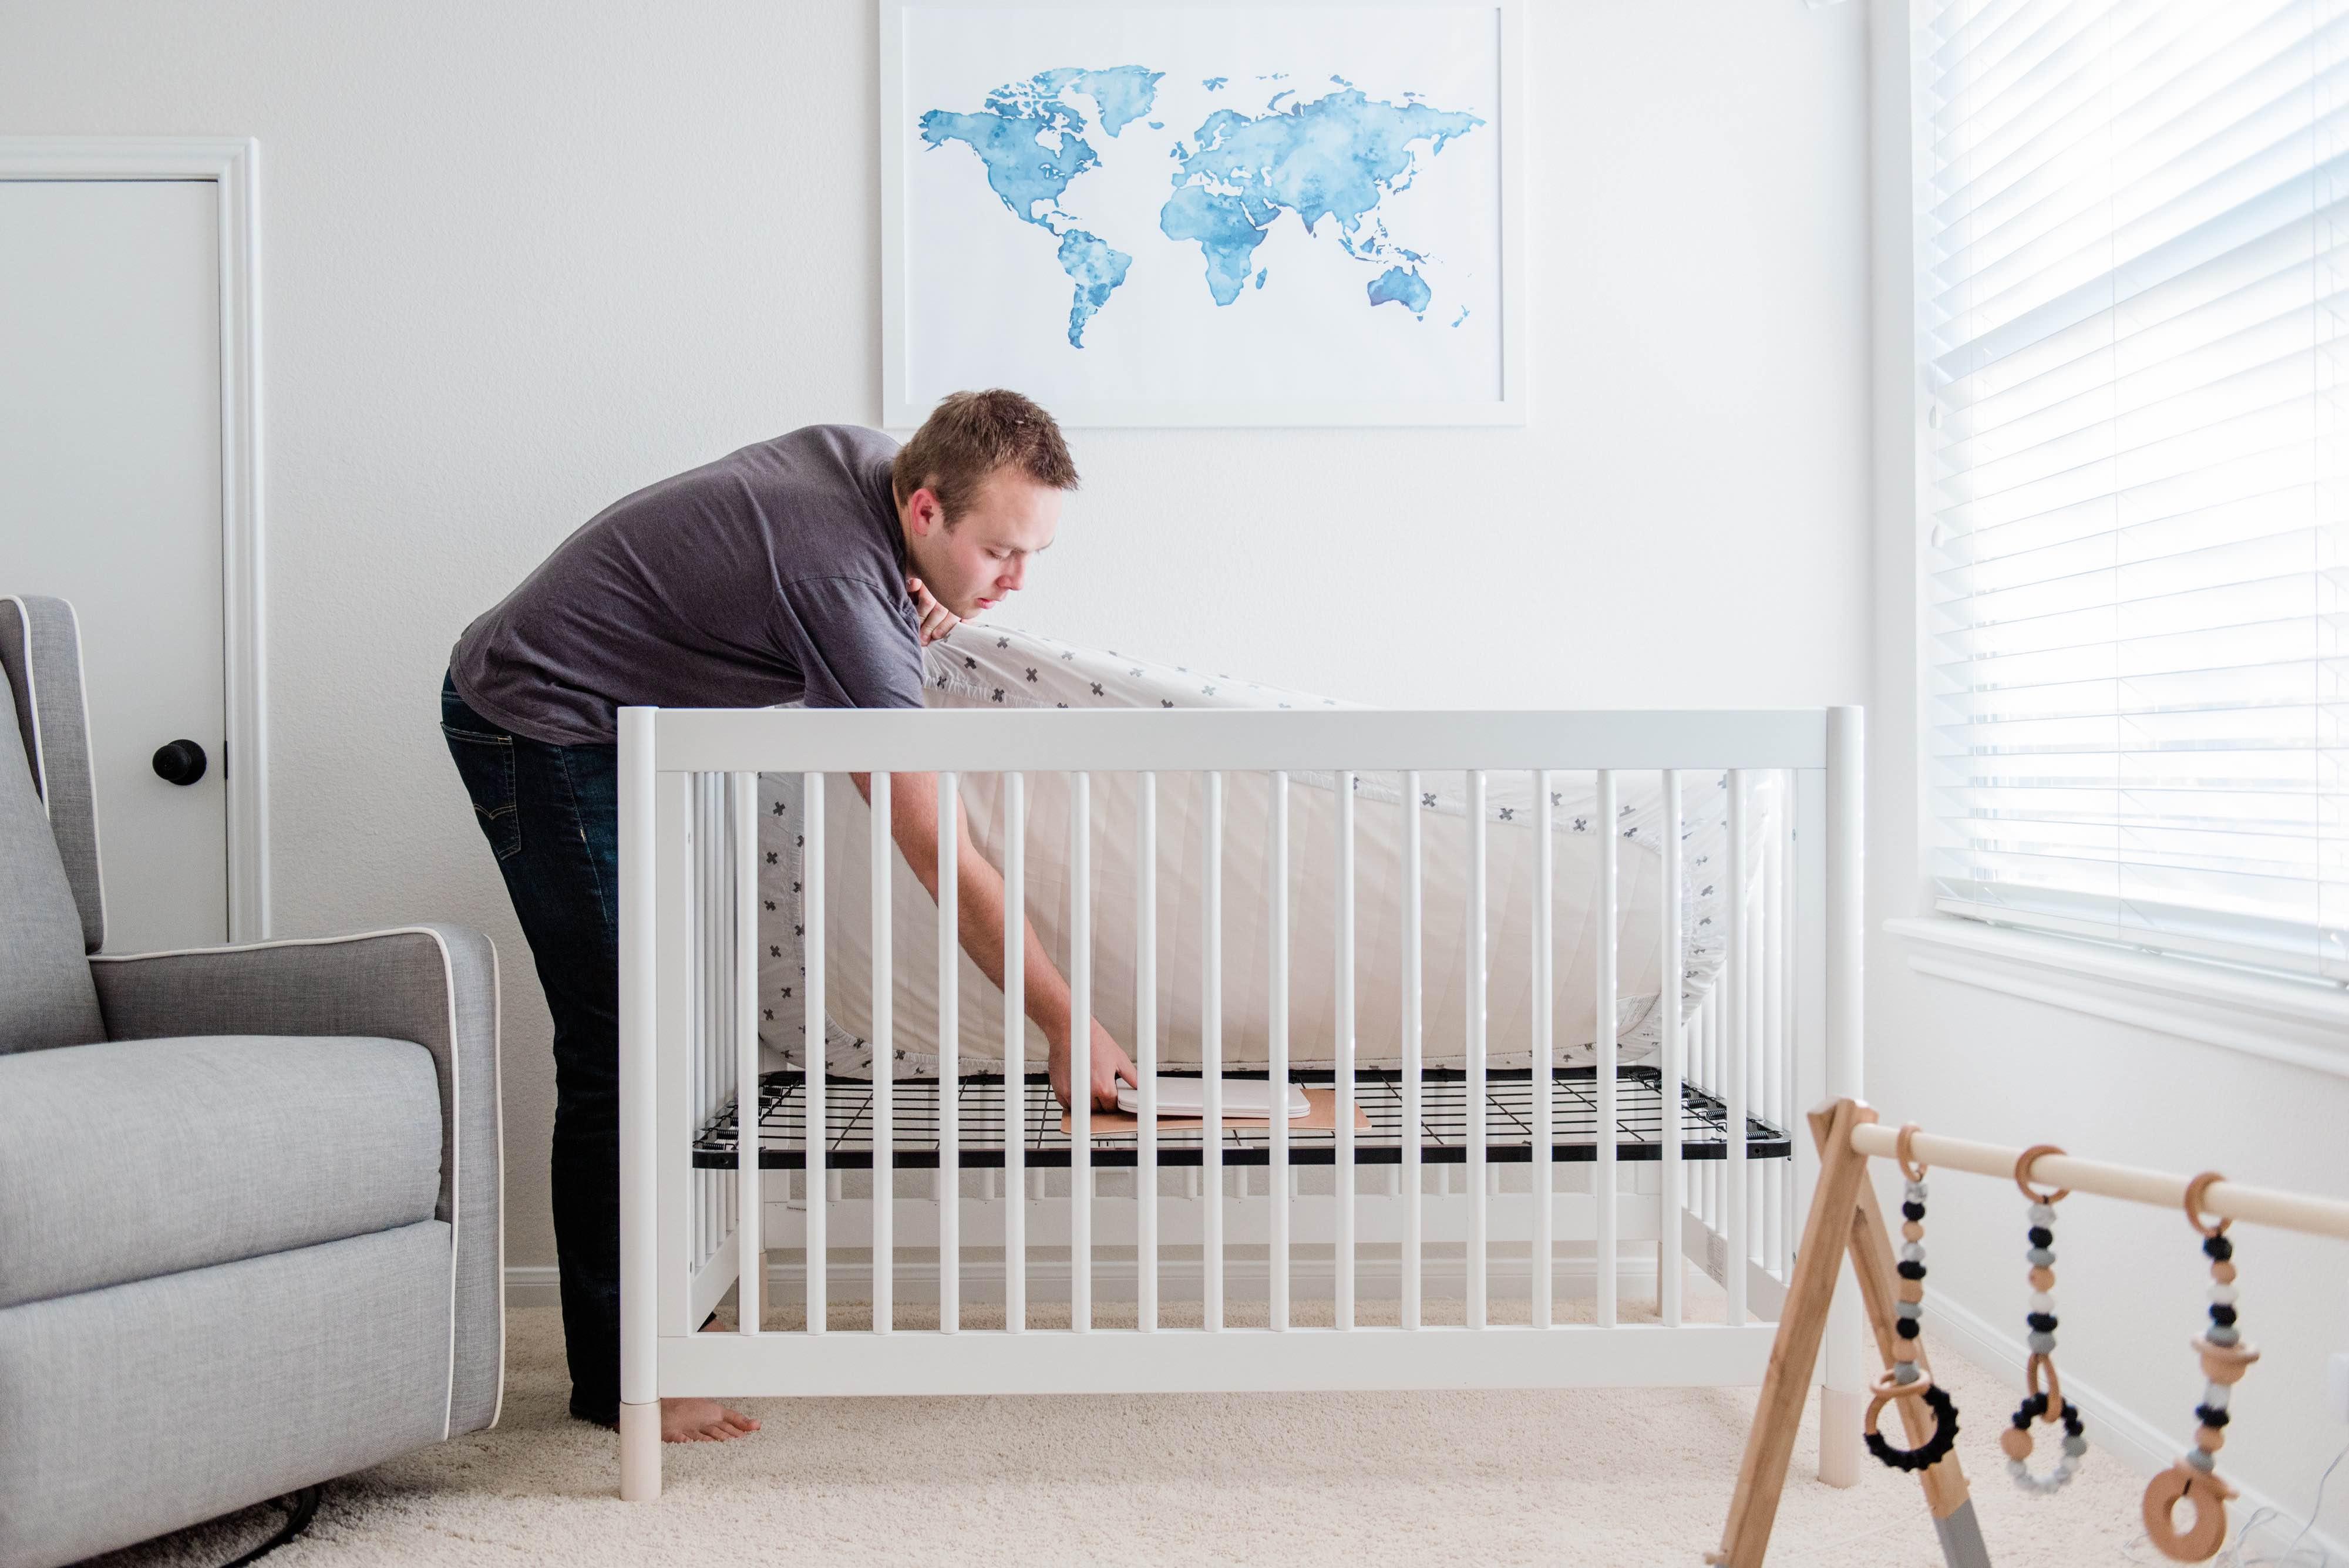 angelcare-movement-sensor-pad-installation-mattress.jpg